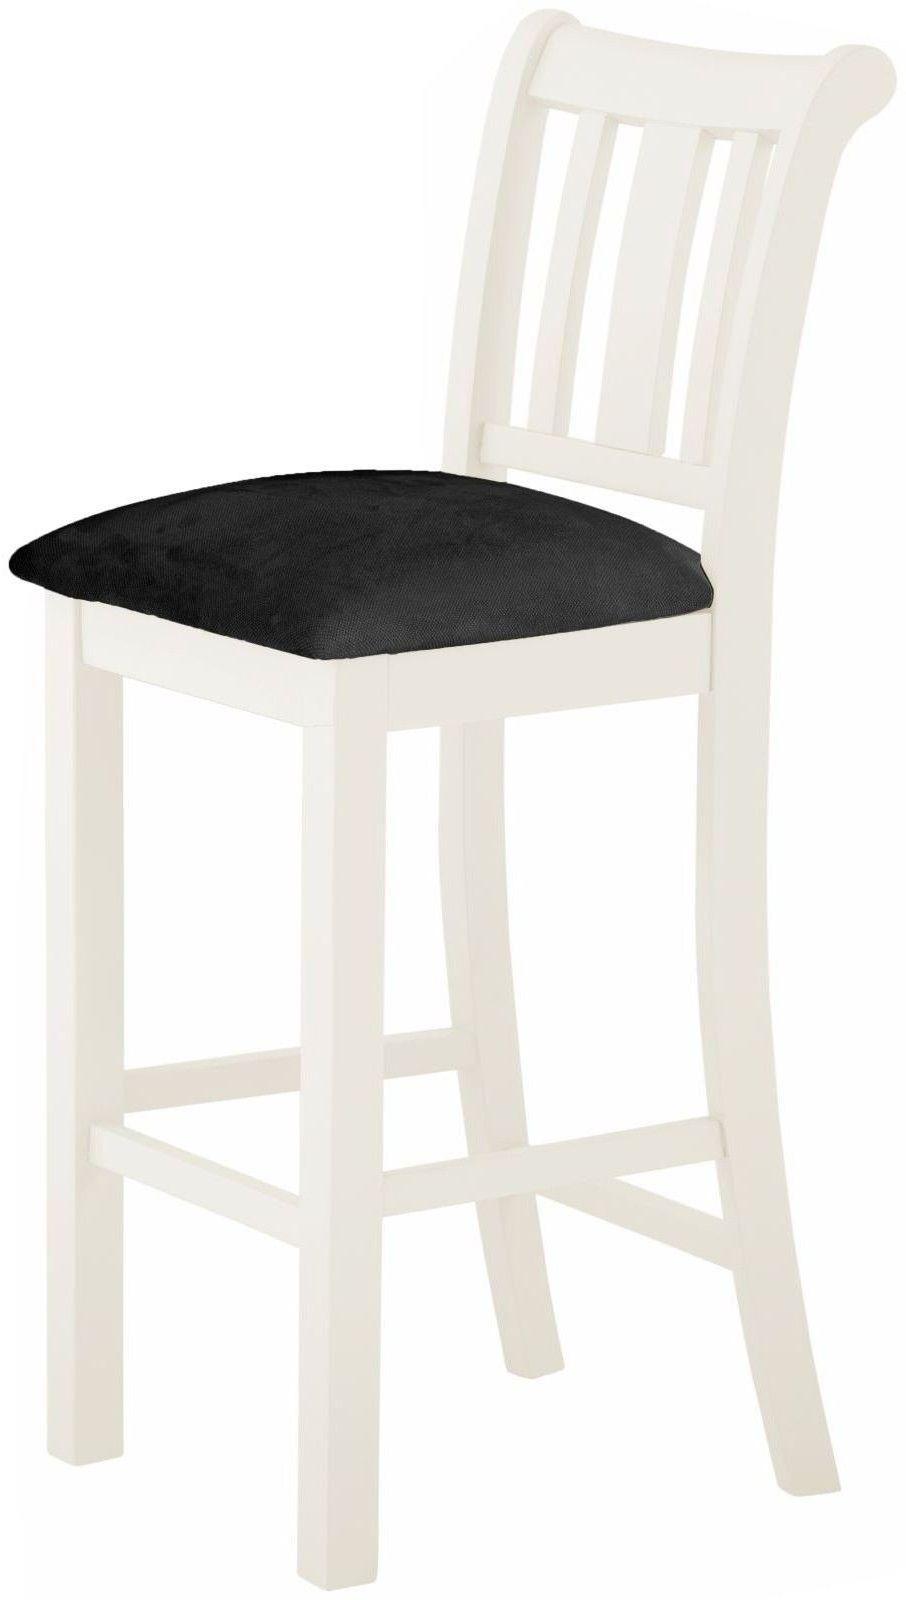 Stratton White Bar Chair Height 1100 Width 440 Depth 500